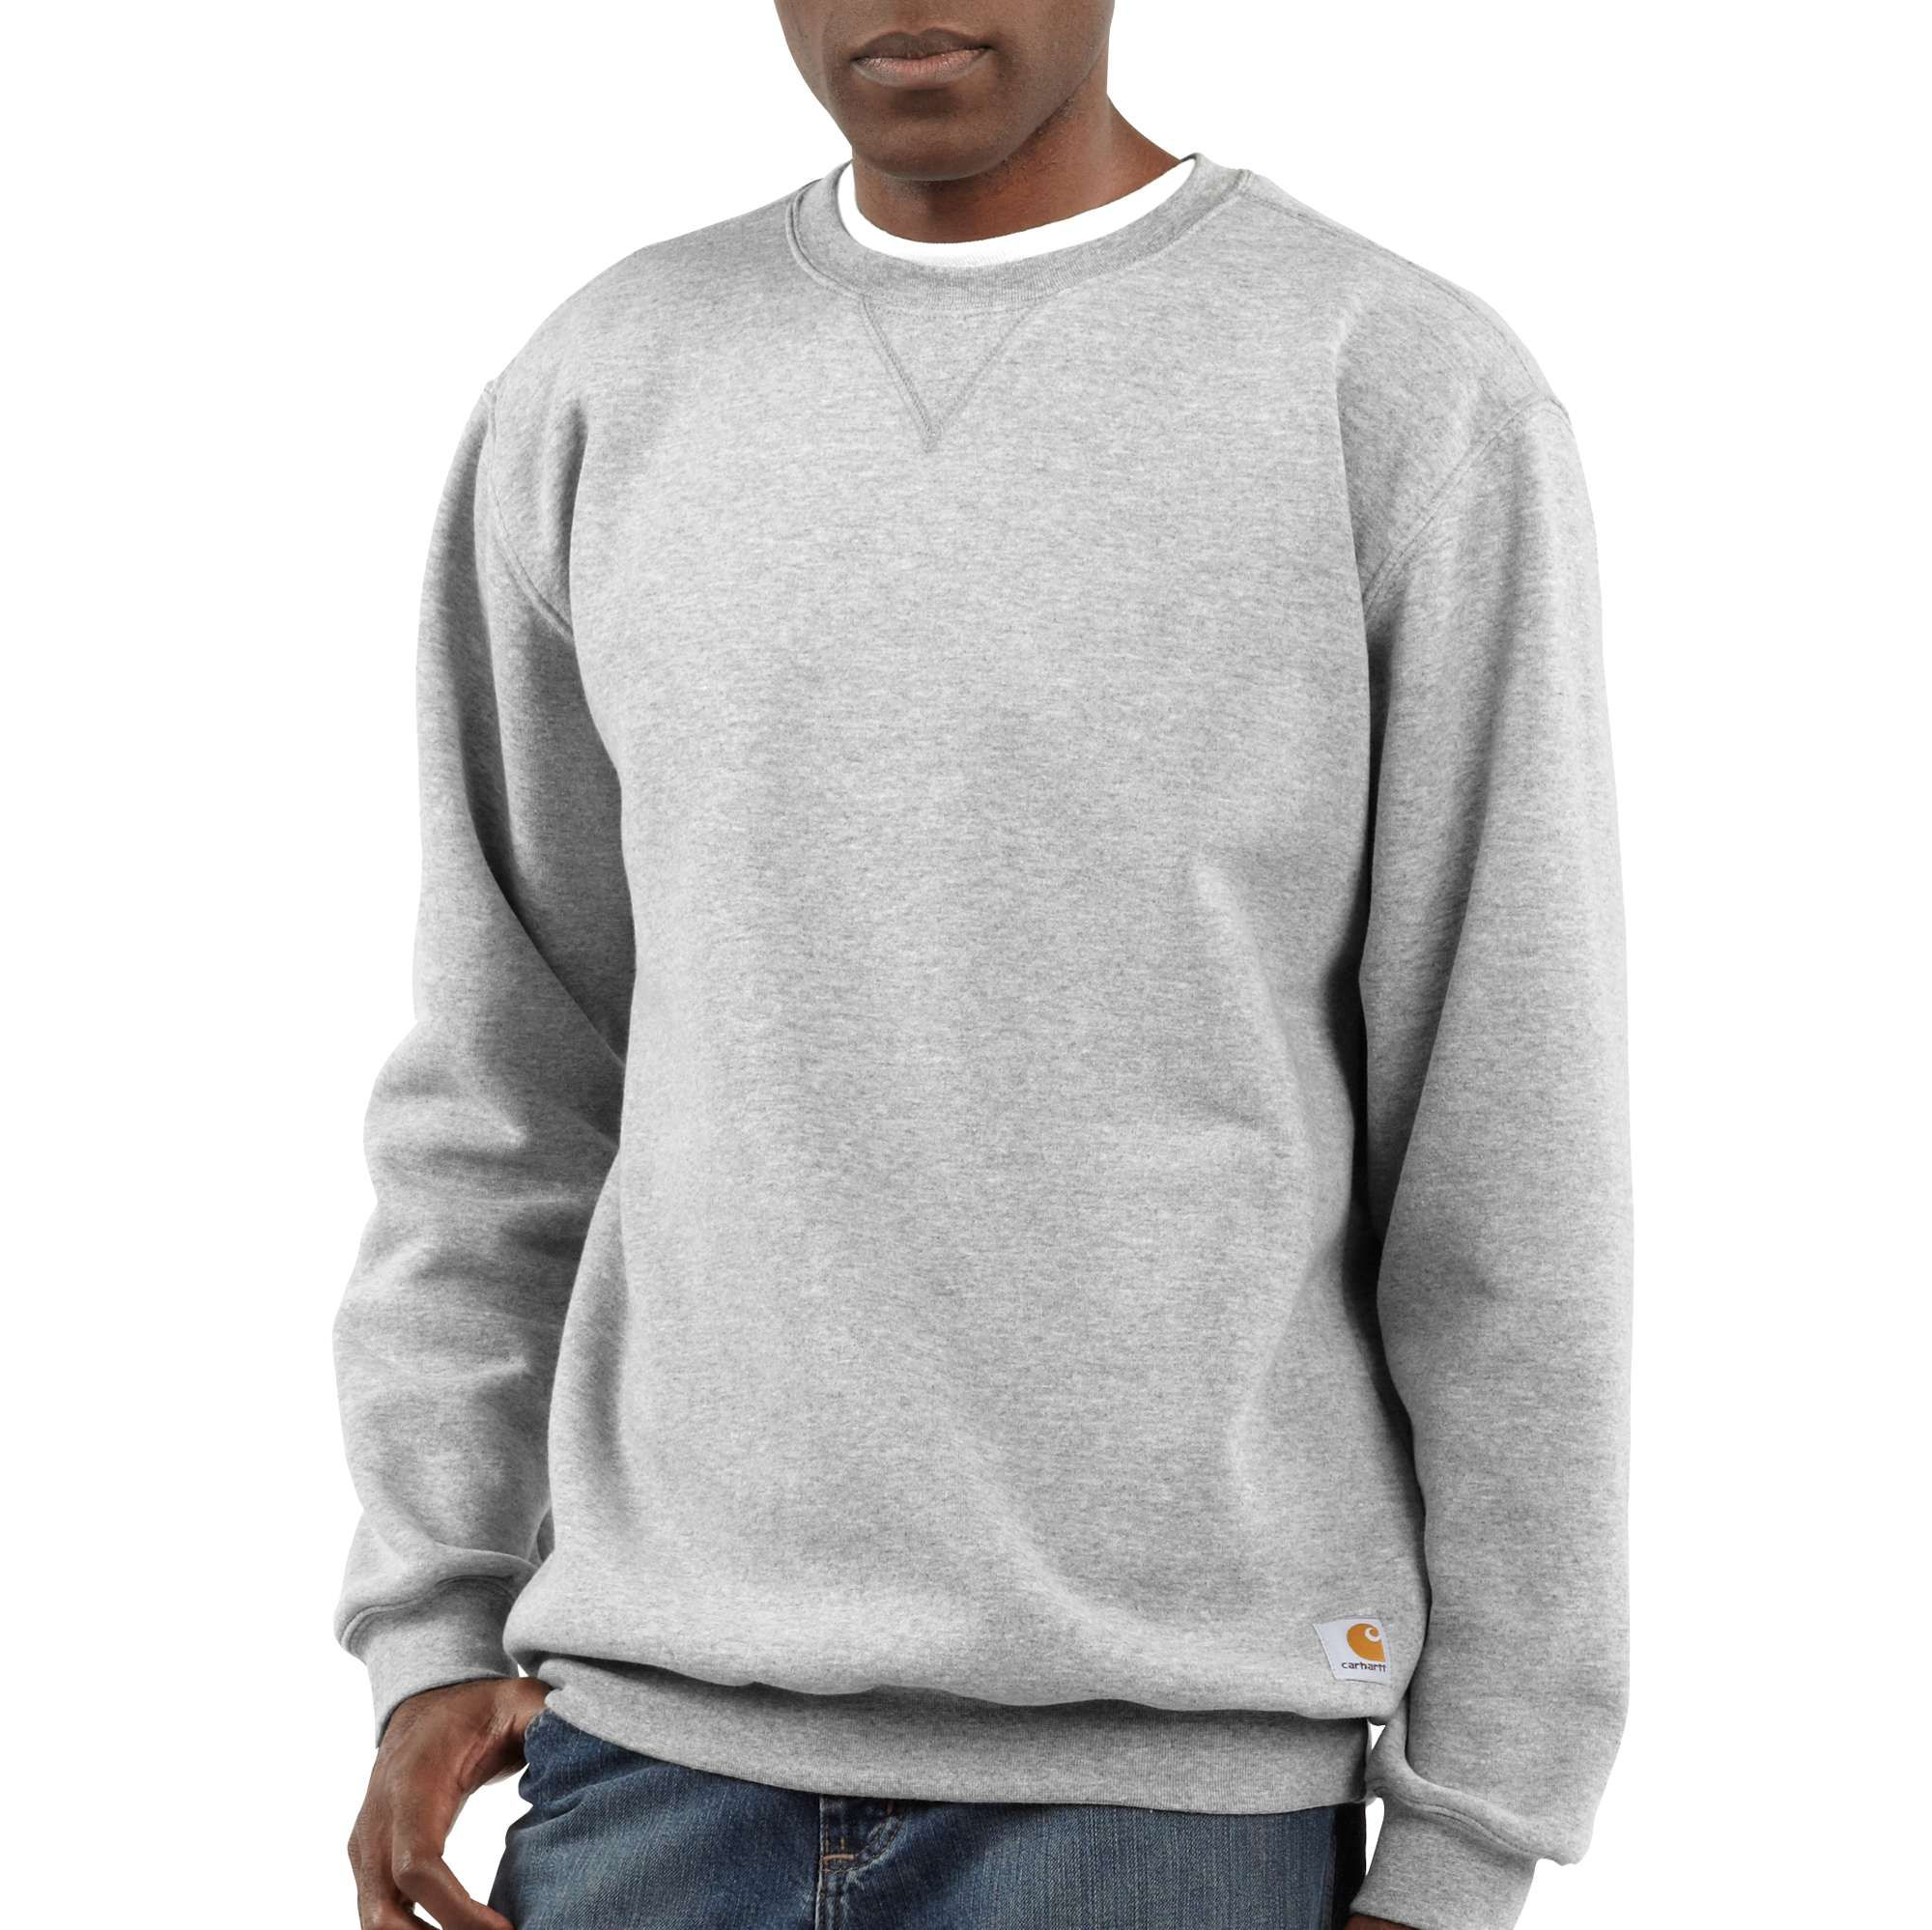 Midweight Crewneck Sweatshirt Carhartt Mens Crew Neck Sweatshirt Grey Sweatshirt Mens [ 1998 x 2000 Pixel ]